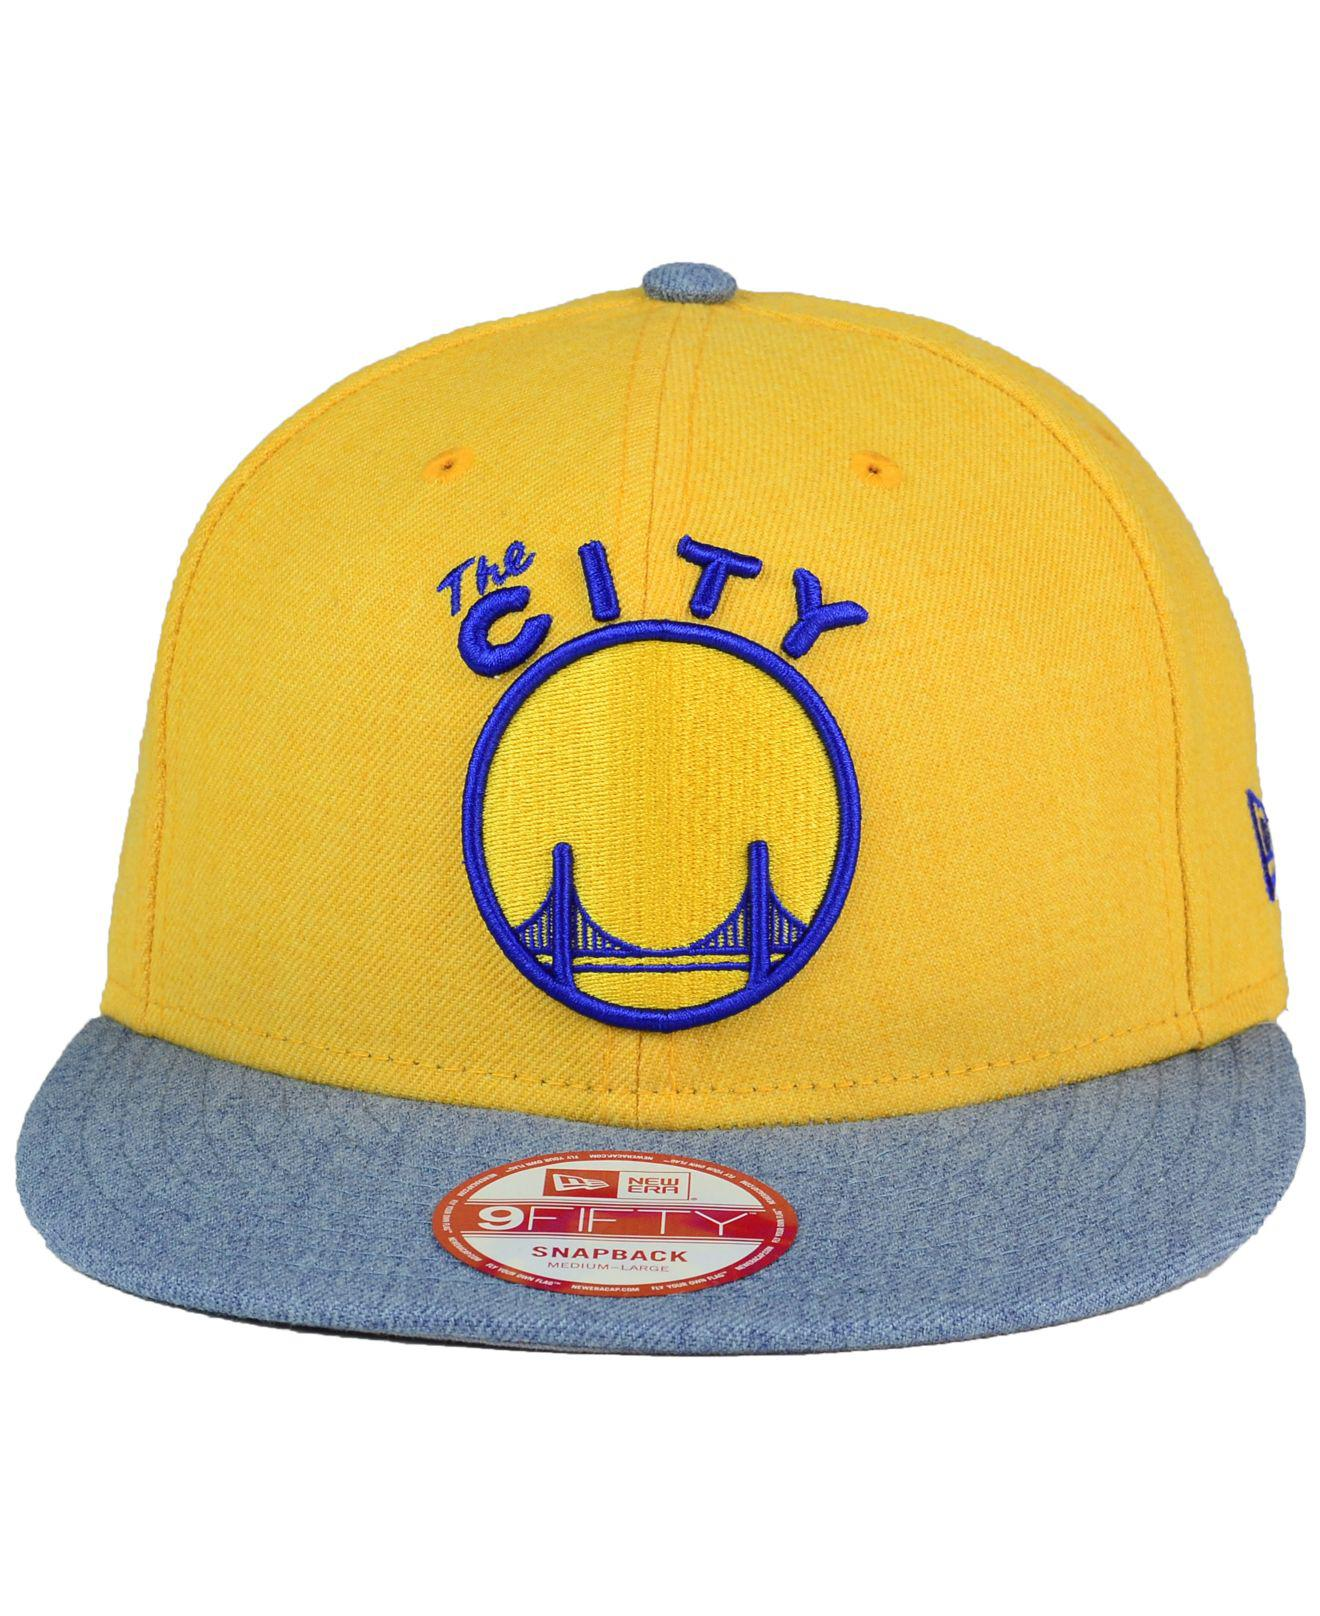 hot sale online 061ba d9032 ... greece lyst ktz golden state warriors heather action 9fifty snapback cap  in yellow for men 143bd